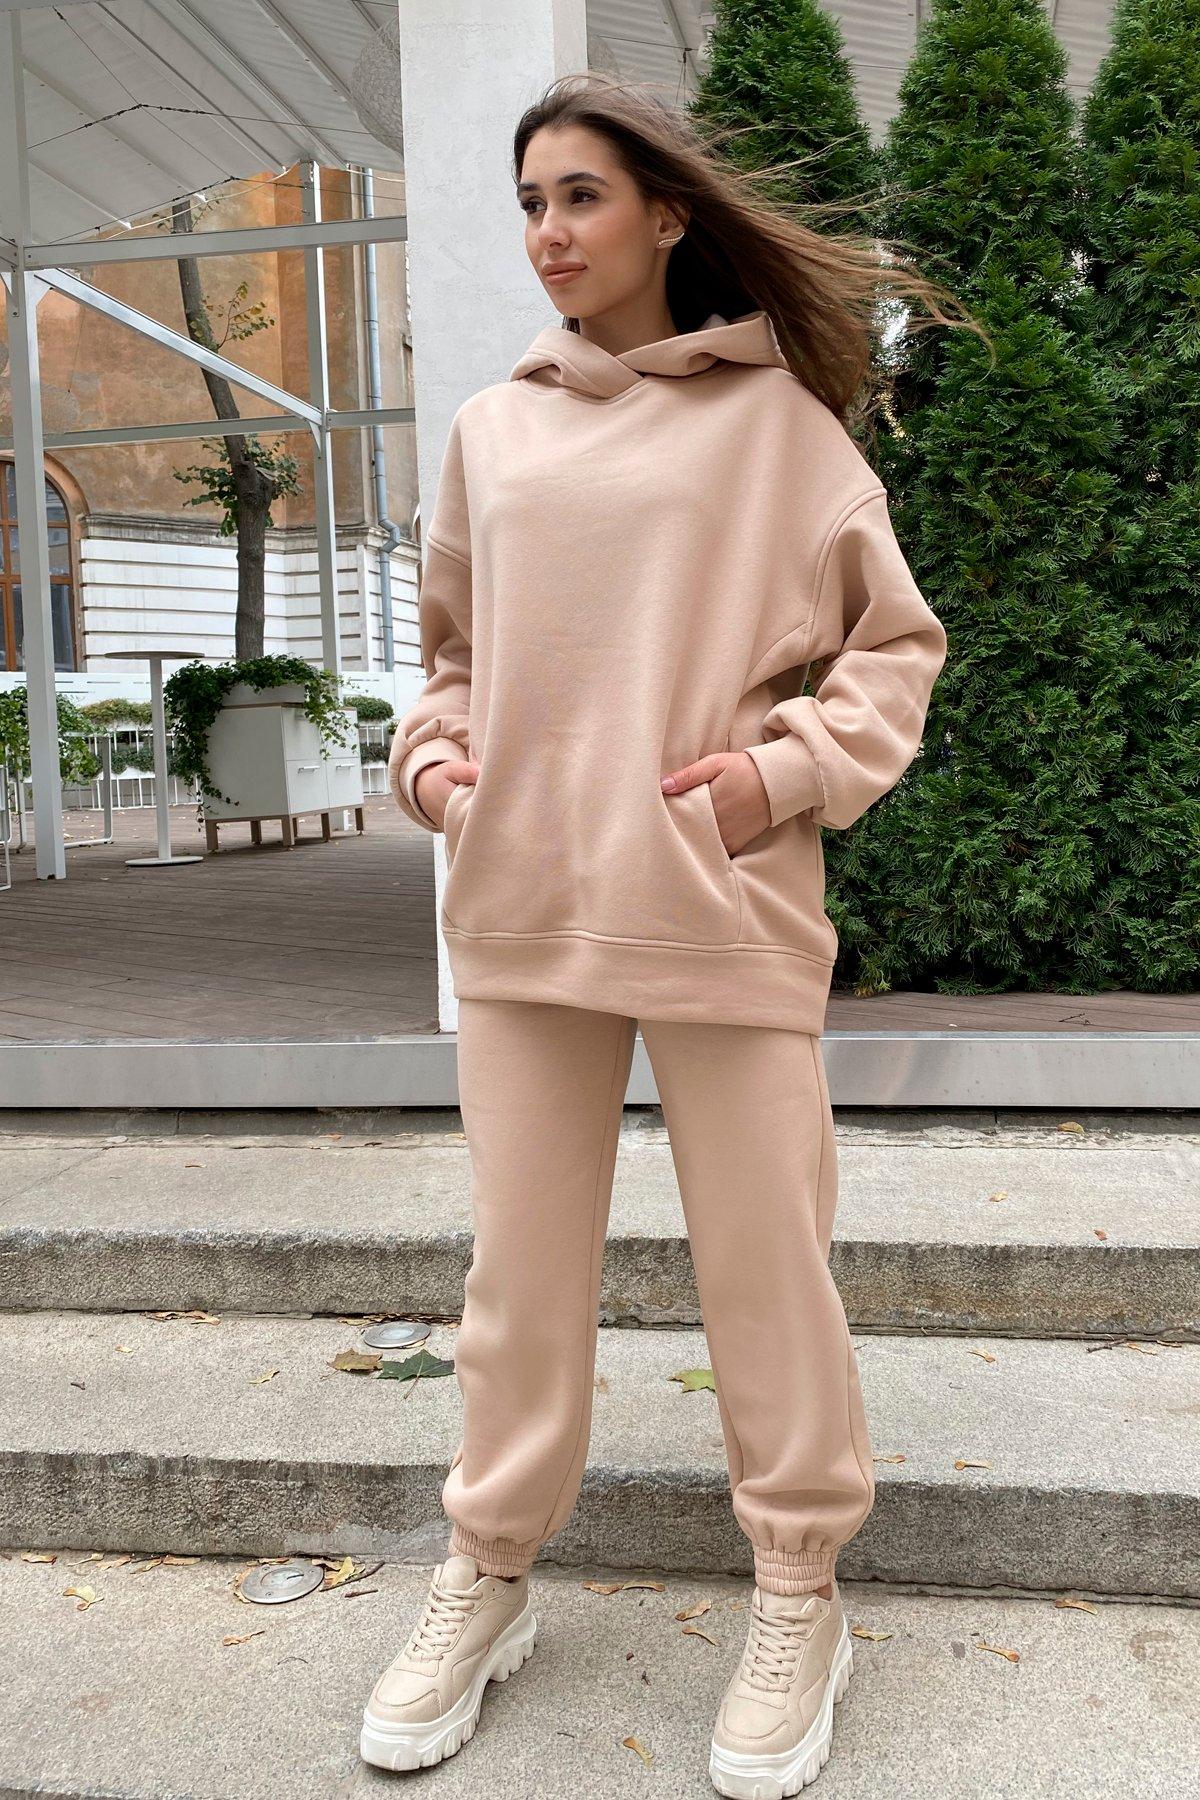 Марион Oversize трикотаж 3х нитка с начесом костюм 9651 АРТ. 45951 Цвет: Бежевый - фото 3, интернет магазин tm-modus.ru